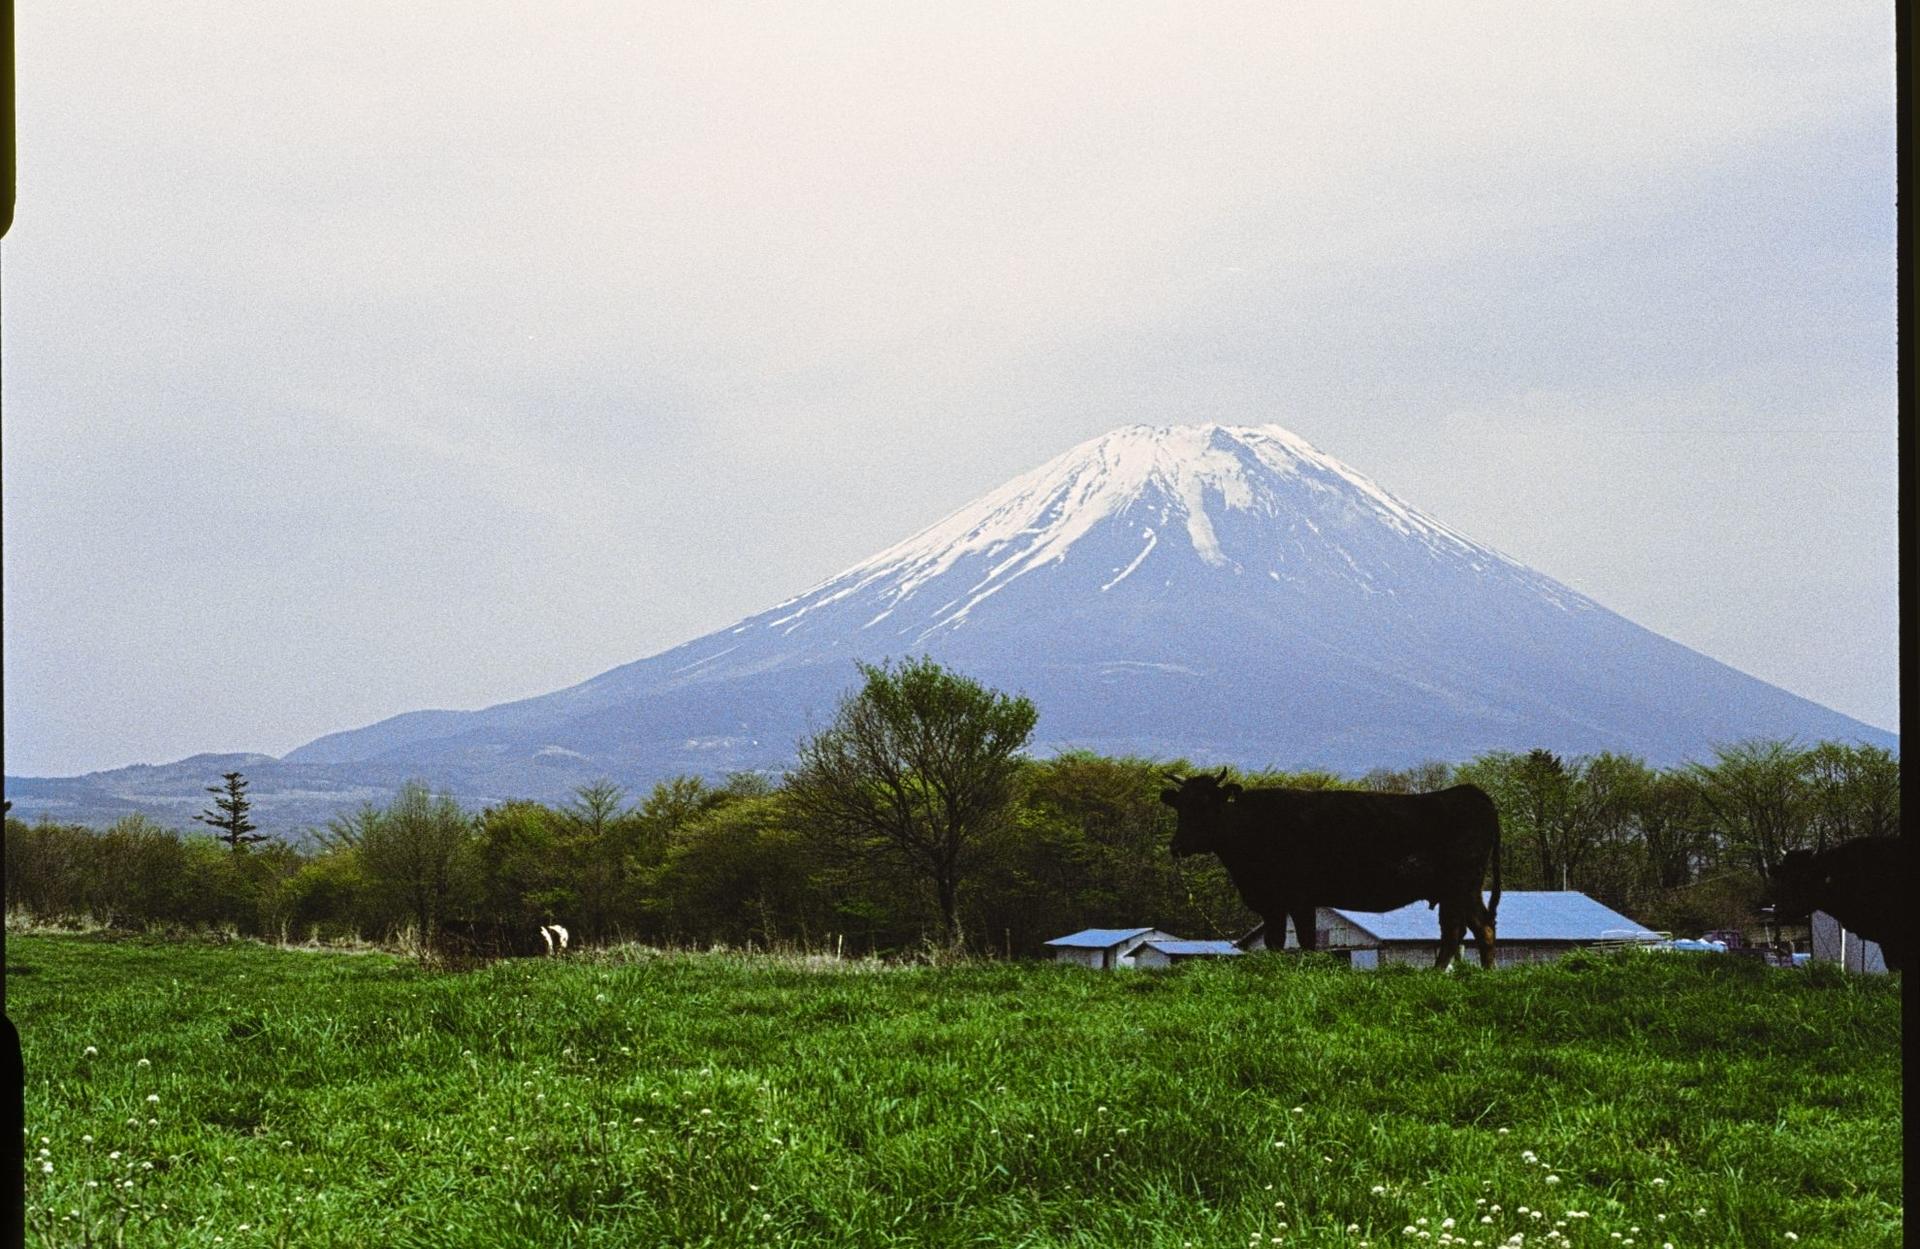 f:id:yasuo_ssi:20201017225820j:plain